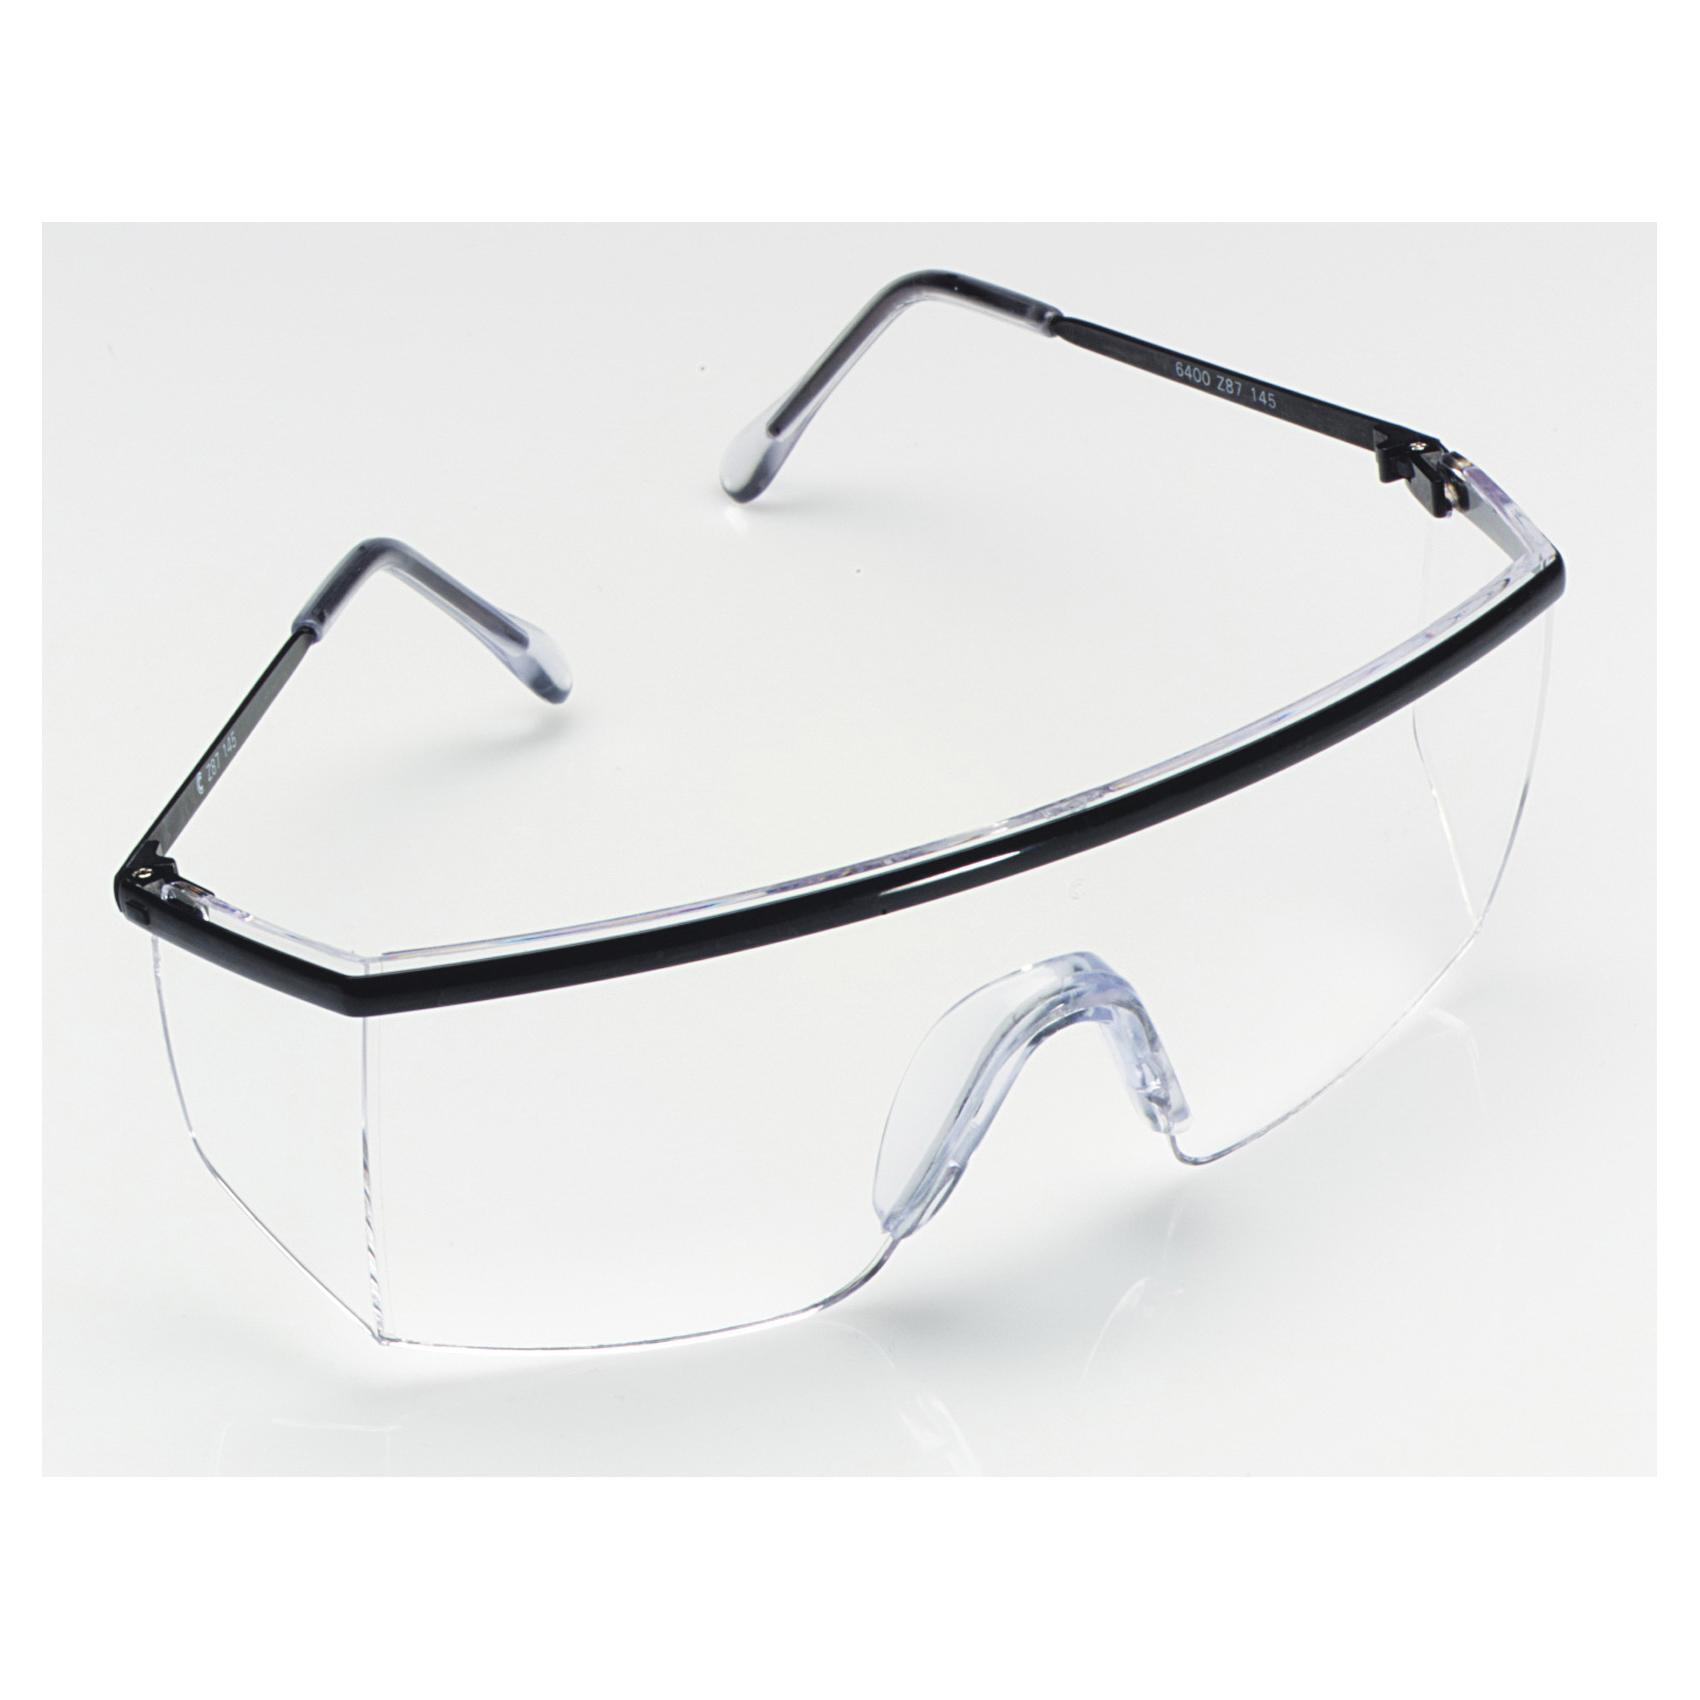 3M™ Nassau Plus™ 078371-62262 Lightweight Safety Glasses, DX™ Anti-Fog, Clear Lens, Half Framed Frame, Black, Plastic Frame, Polycarbonate Lens, ANSI Z87.1-2003, CSA Z94.3-2007